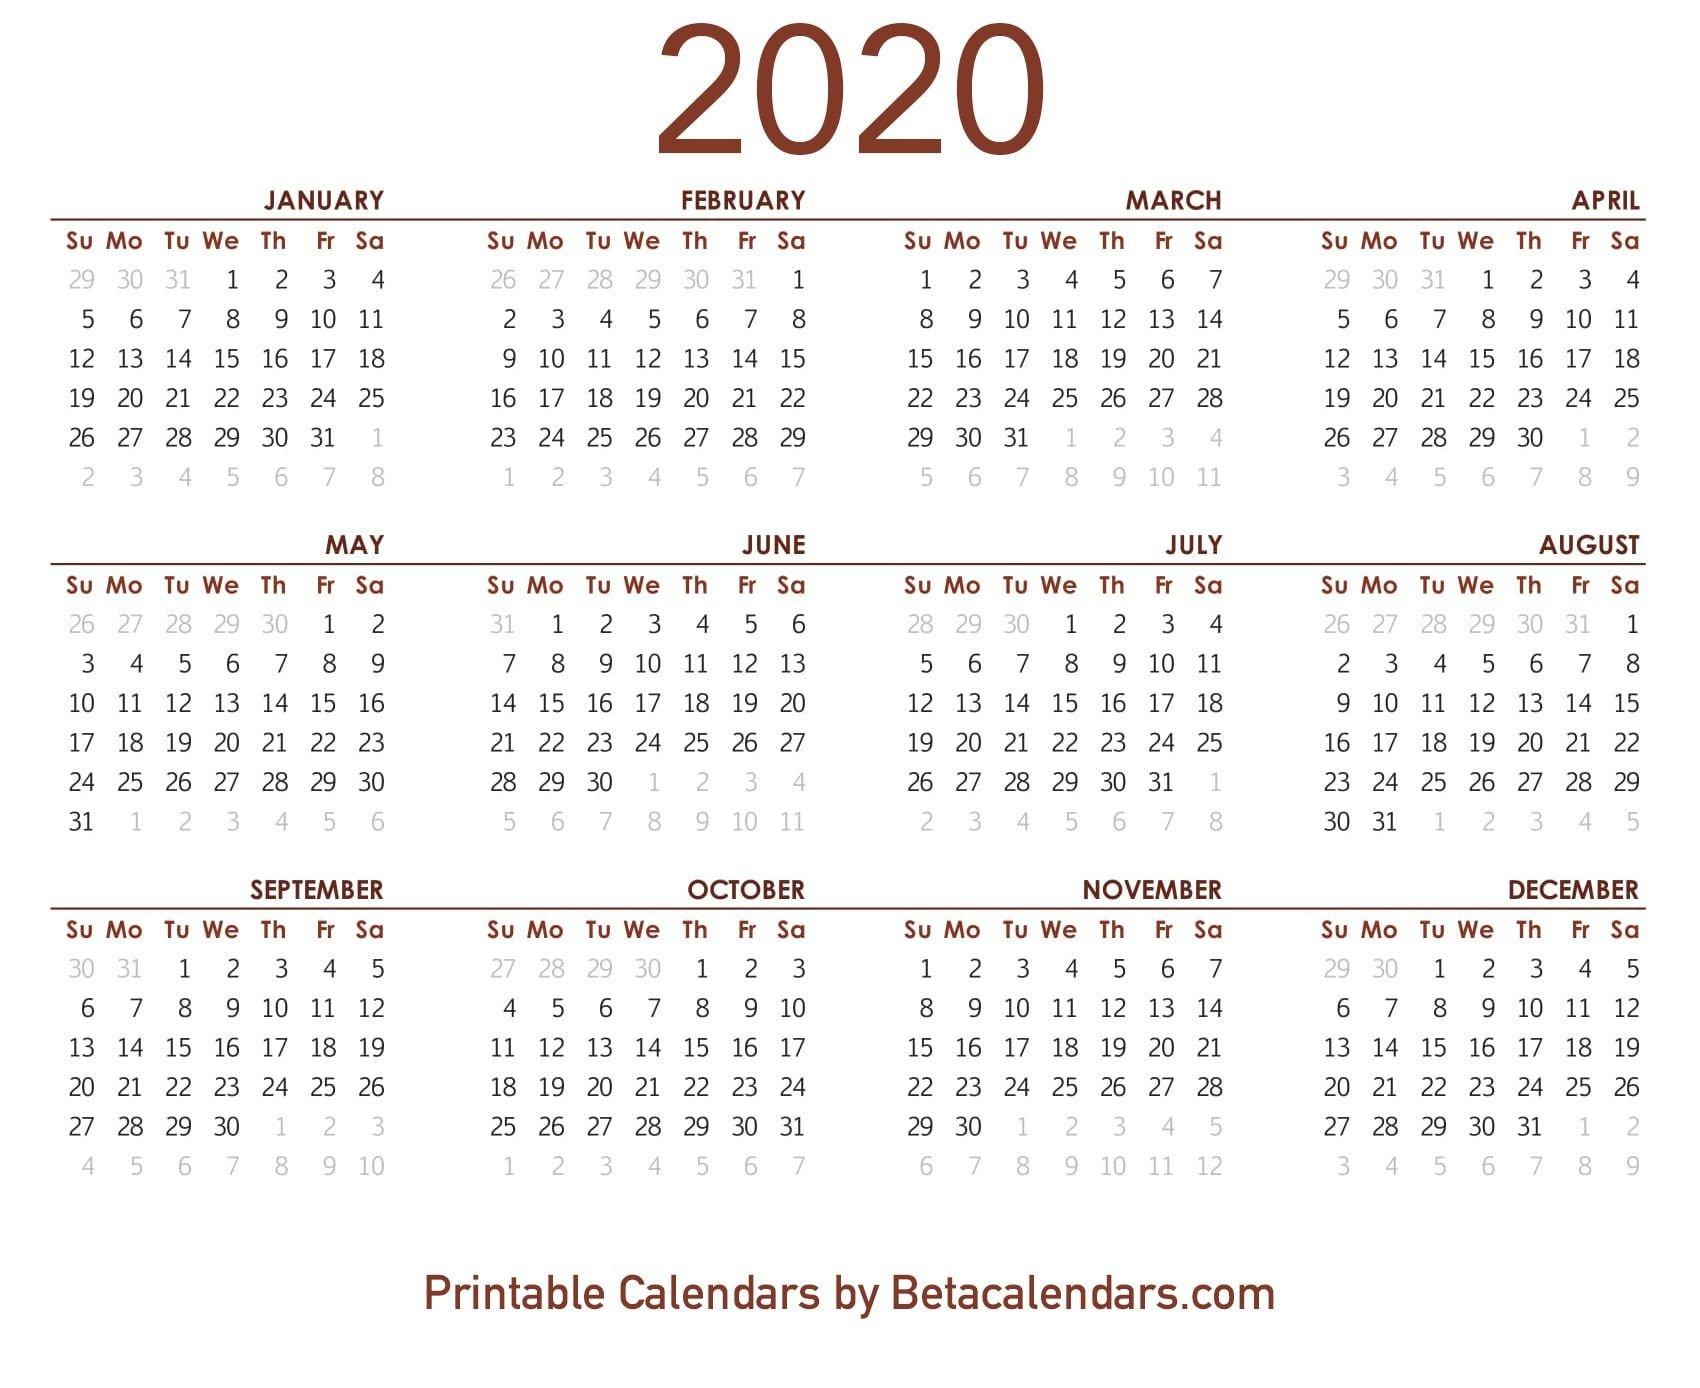 2020 Calendar 8 1/2 X 11 | Free Printable Calendar Free Printable 8 1/2 X 11 Calendar